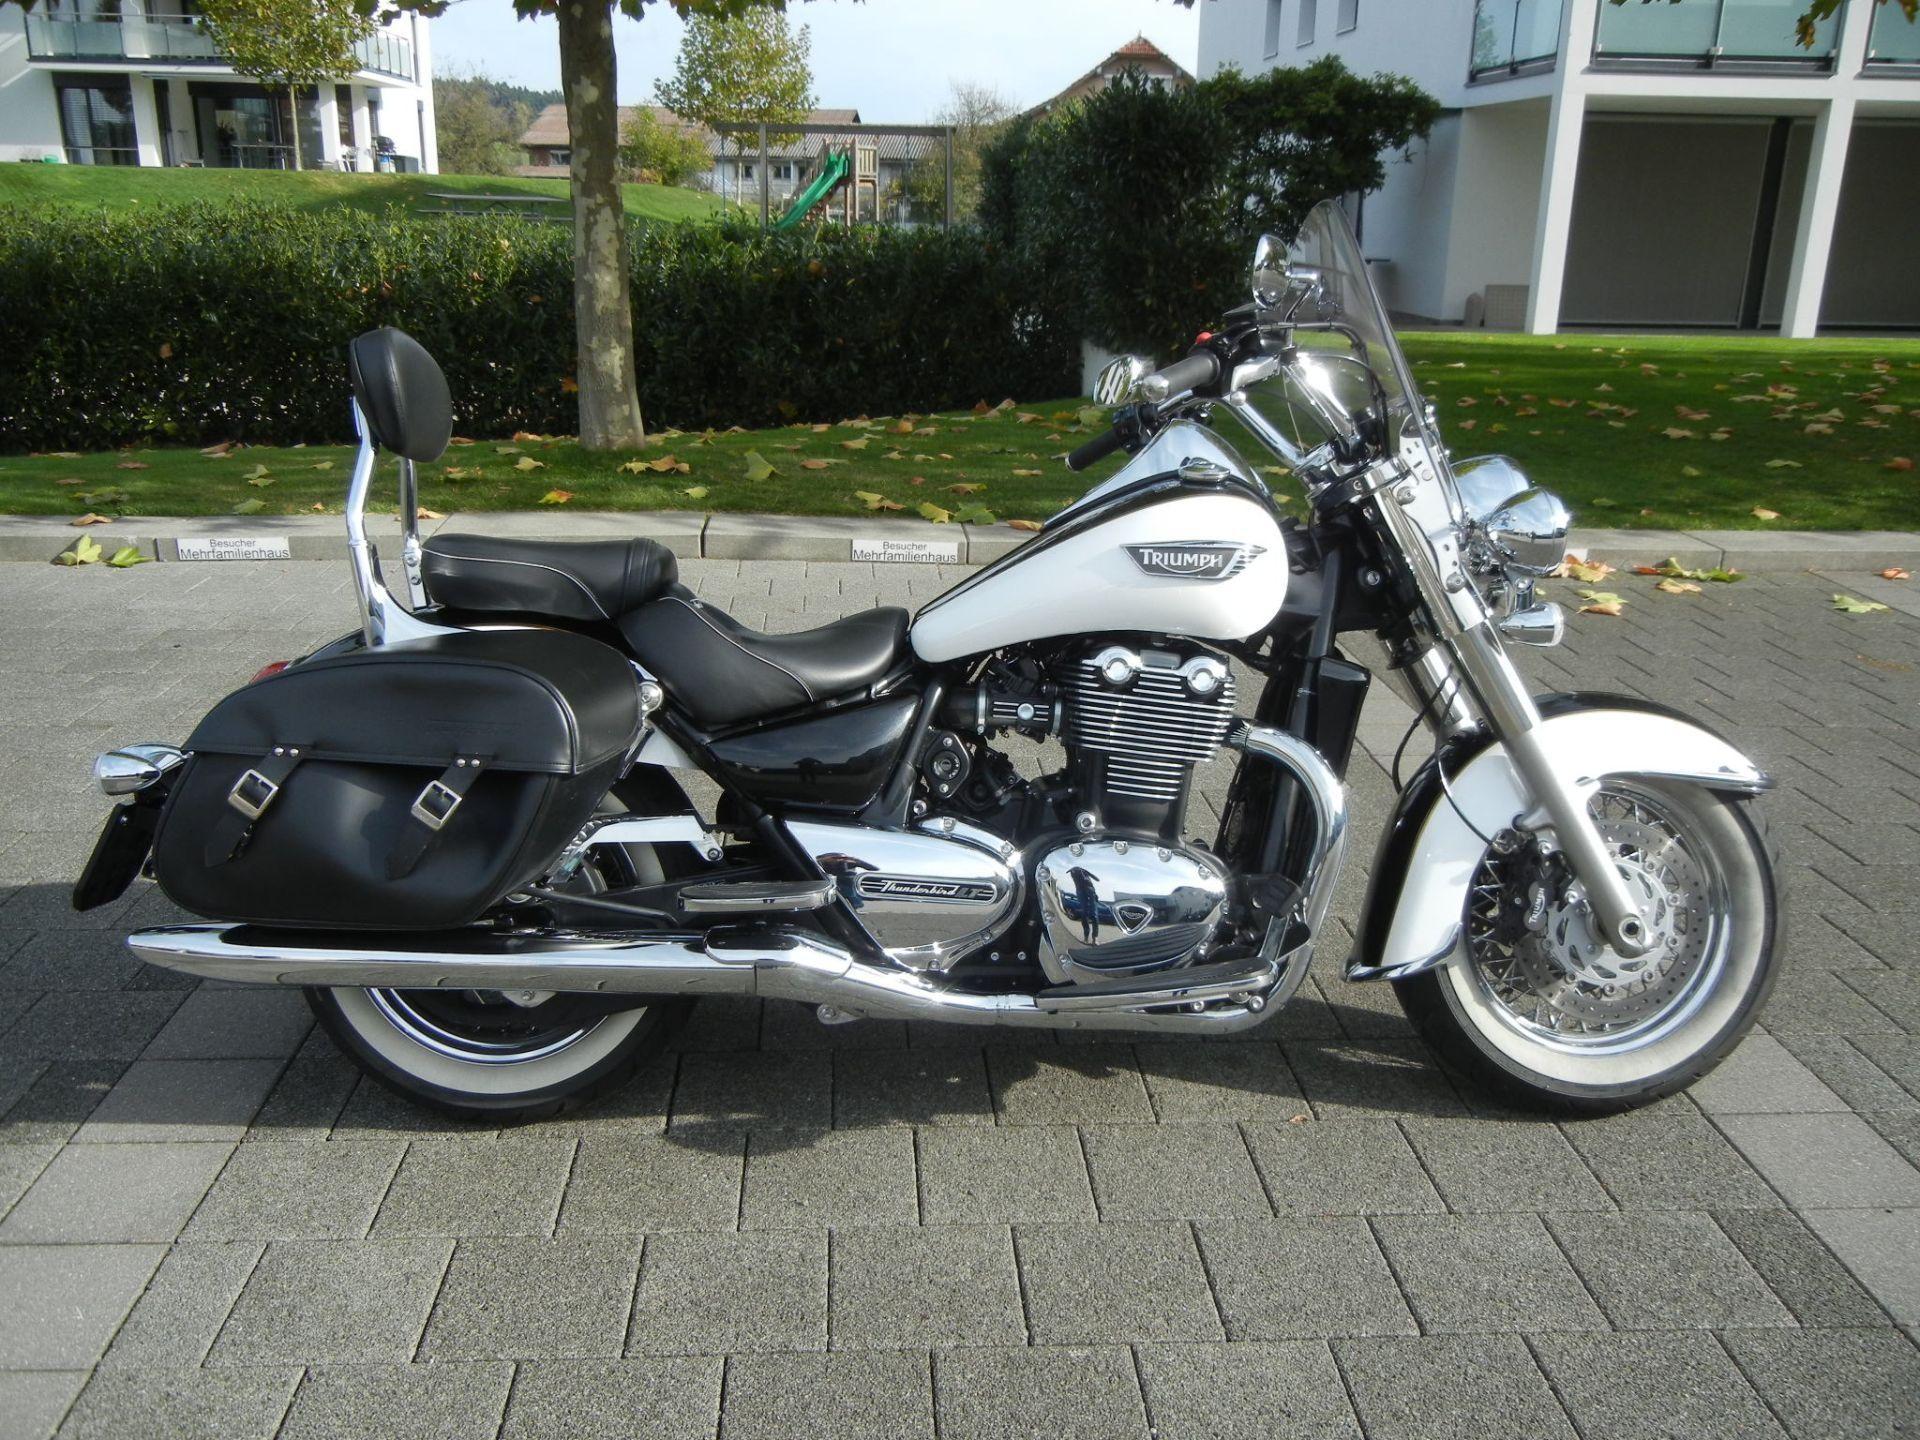 motorrad occasion kaufen triumph thunderbird 1700 abs lt iff motorcycles ag gettnau. Black Bedroom Furniture Sets. Home Design Ideas